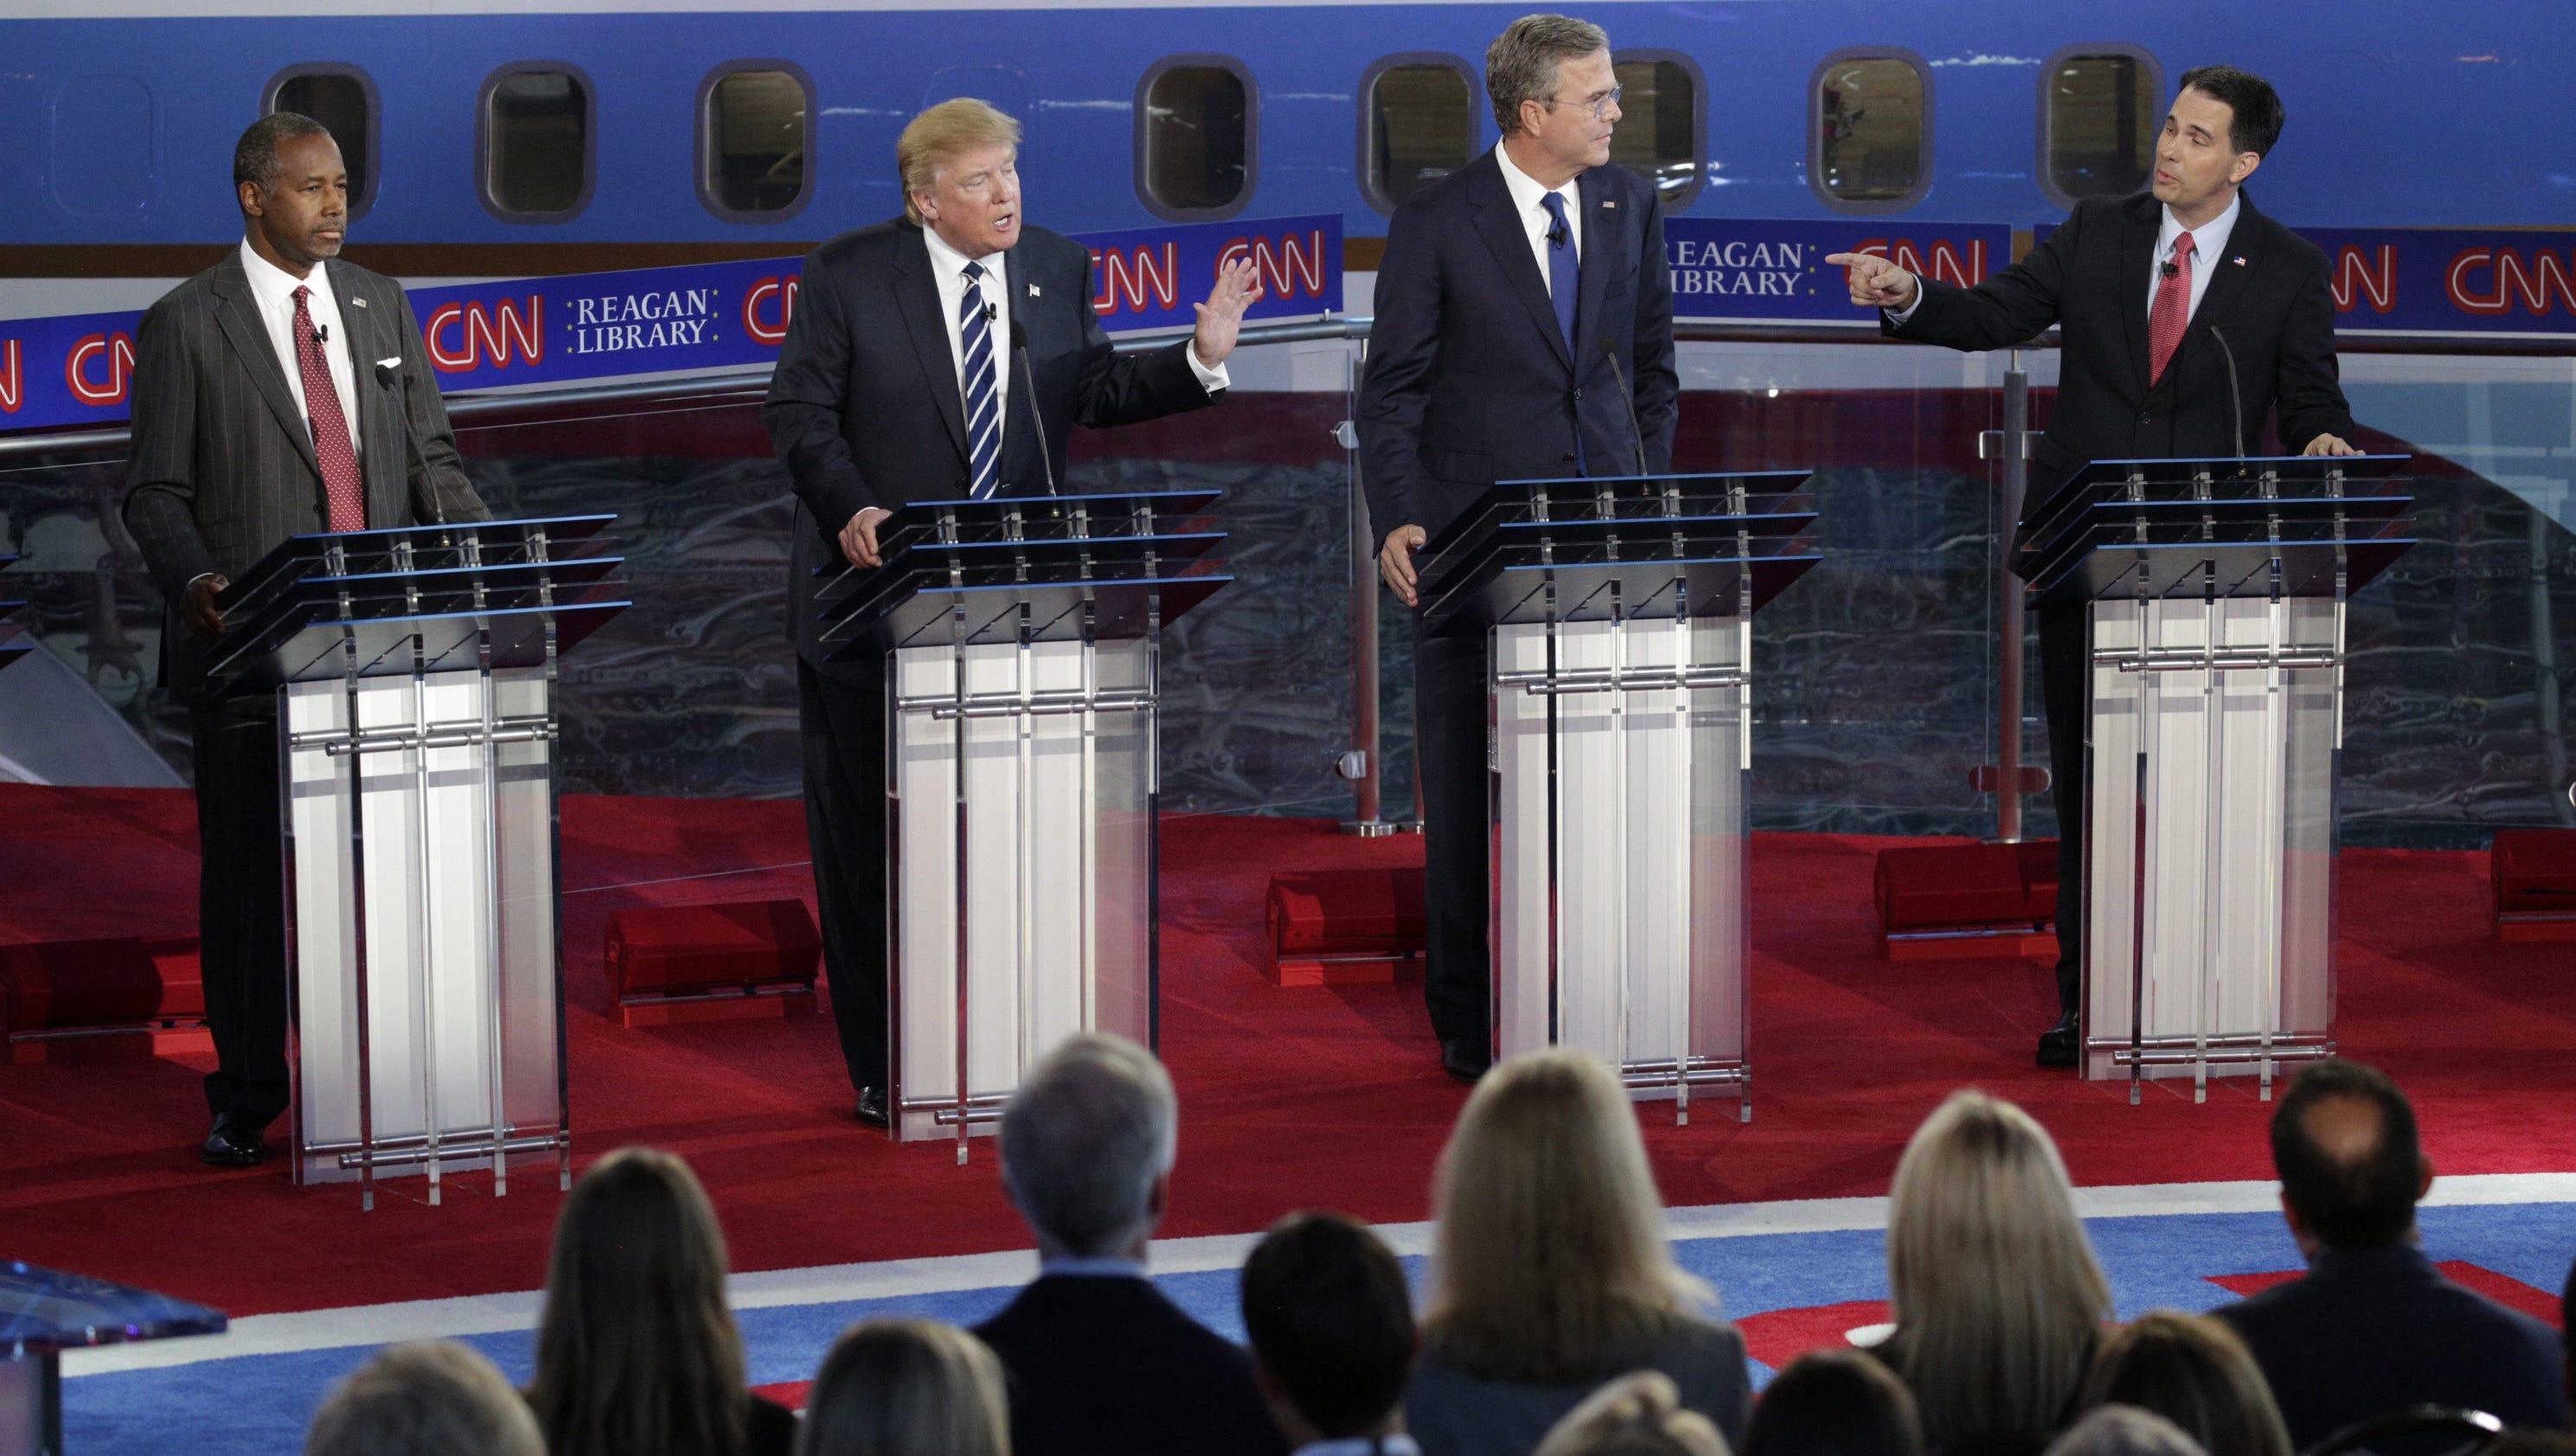 Ronald Reagan Library Debate